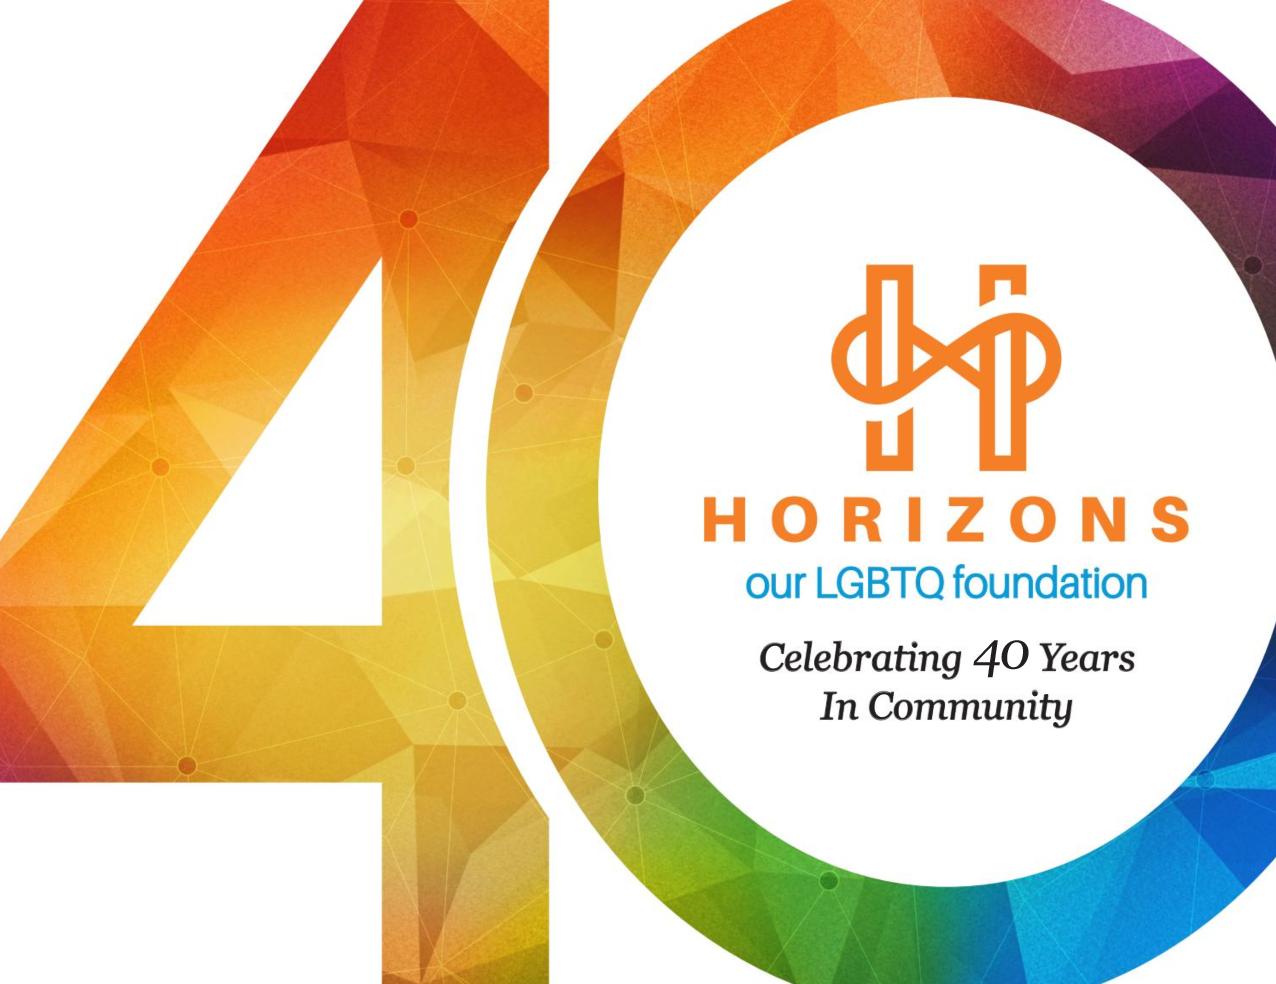 Celebrating 40 Years in Community